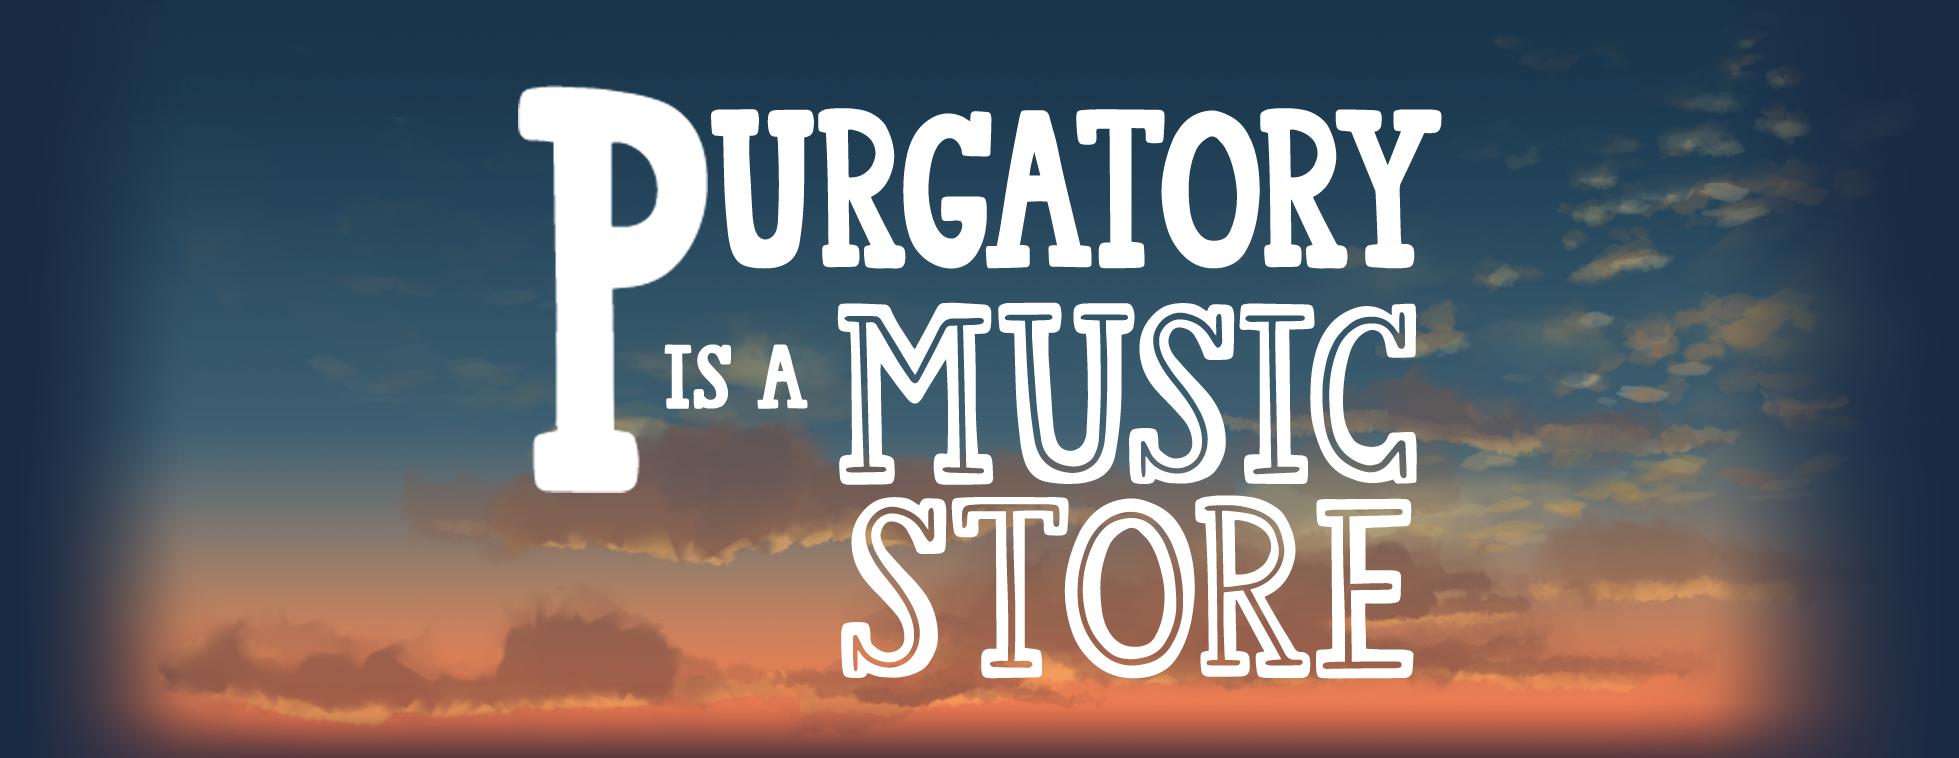 Purgatory is a Music Store